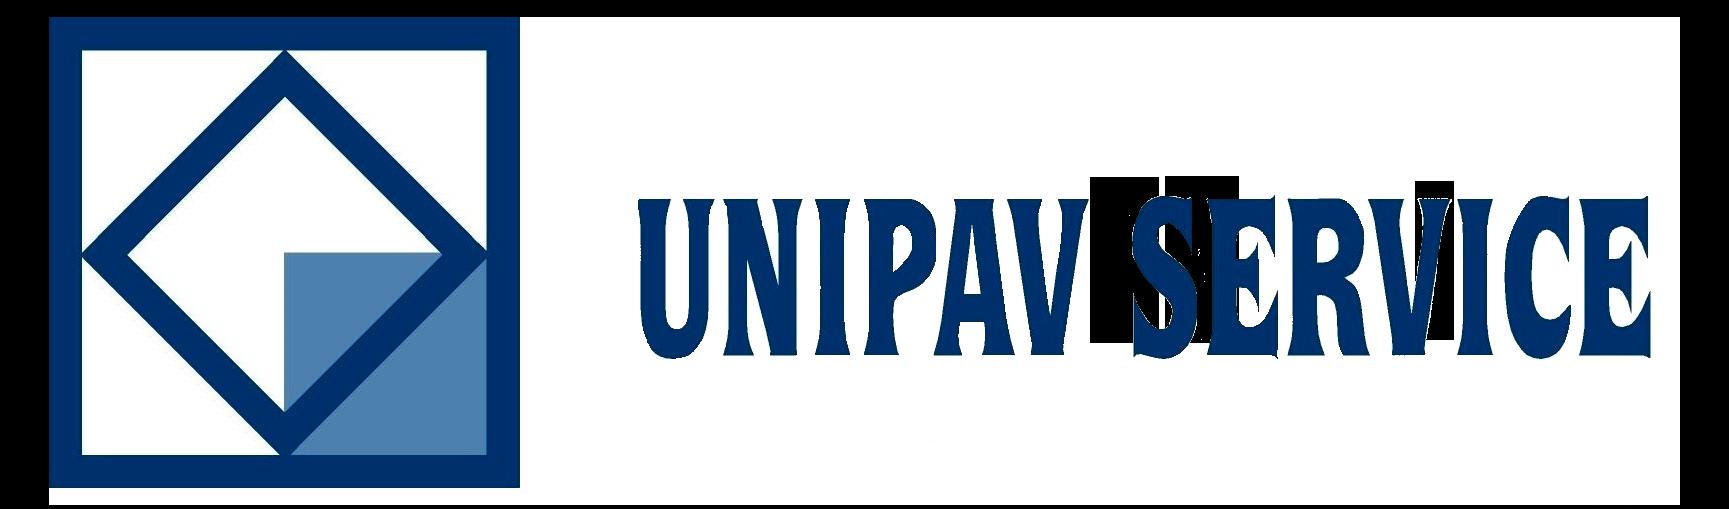 unipav-logo-web-corretto